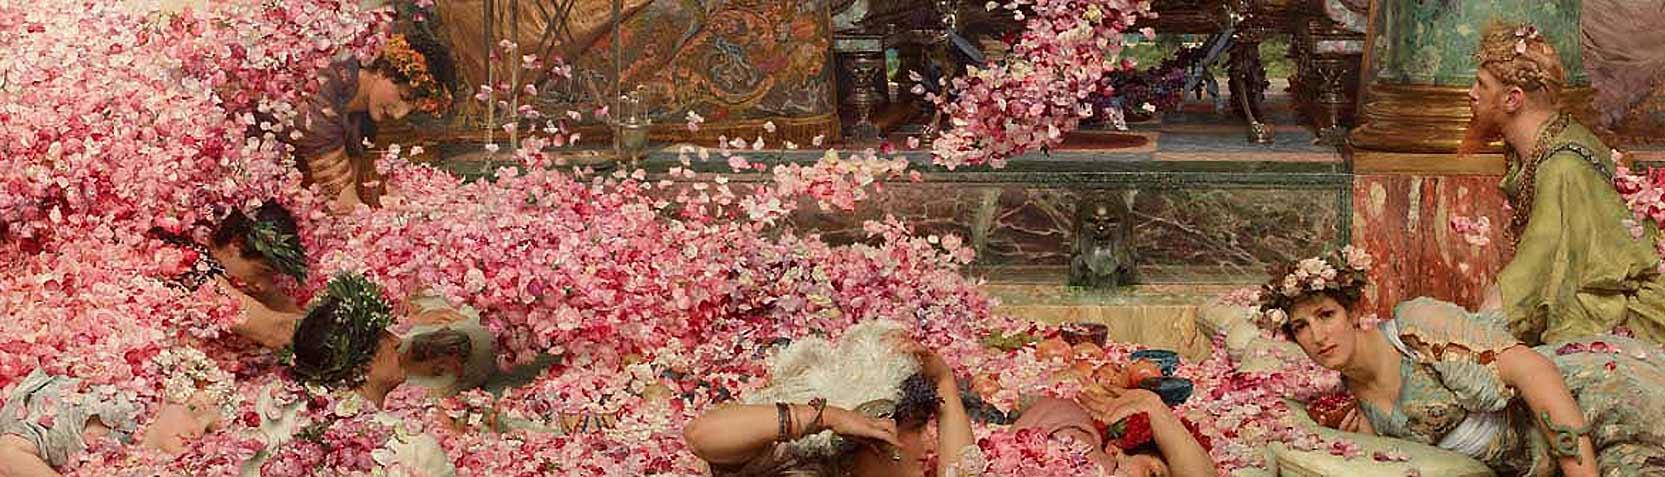 Artistes - Sir Lawrence Alma-Tadema